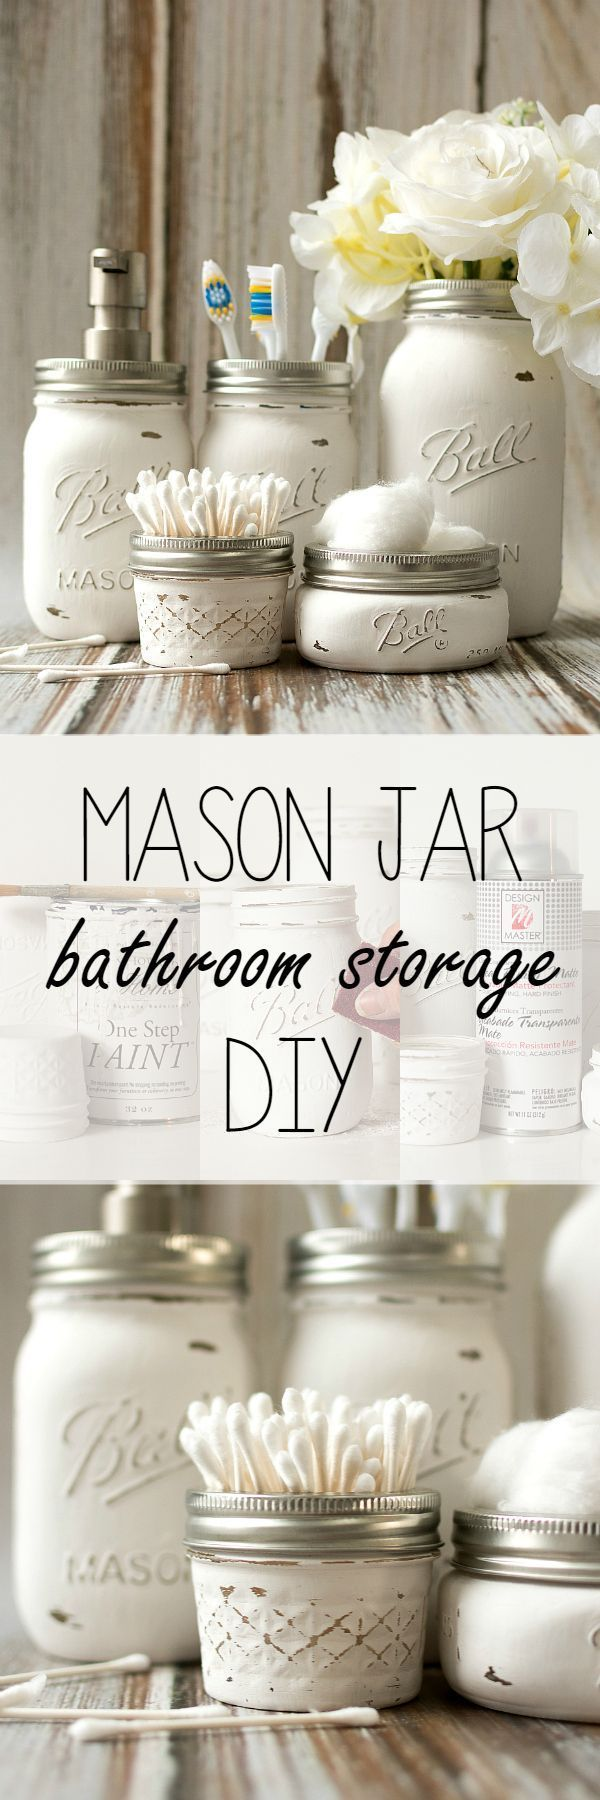 Rustikale badezimmerdekorideen mason jar bathroom storage u accessories  potes de vidro vidros e